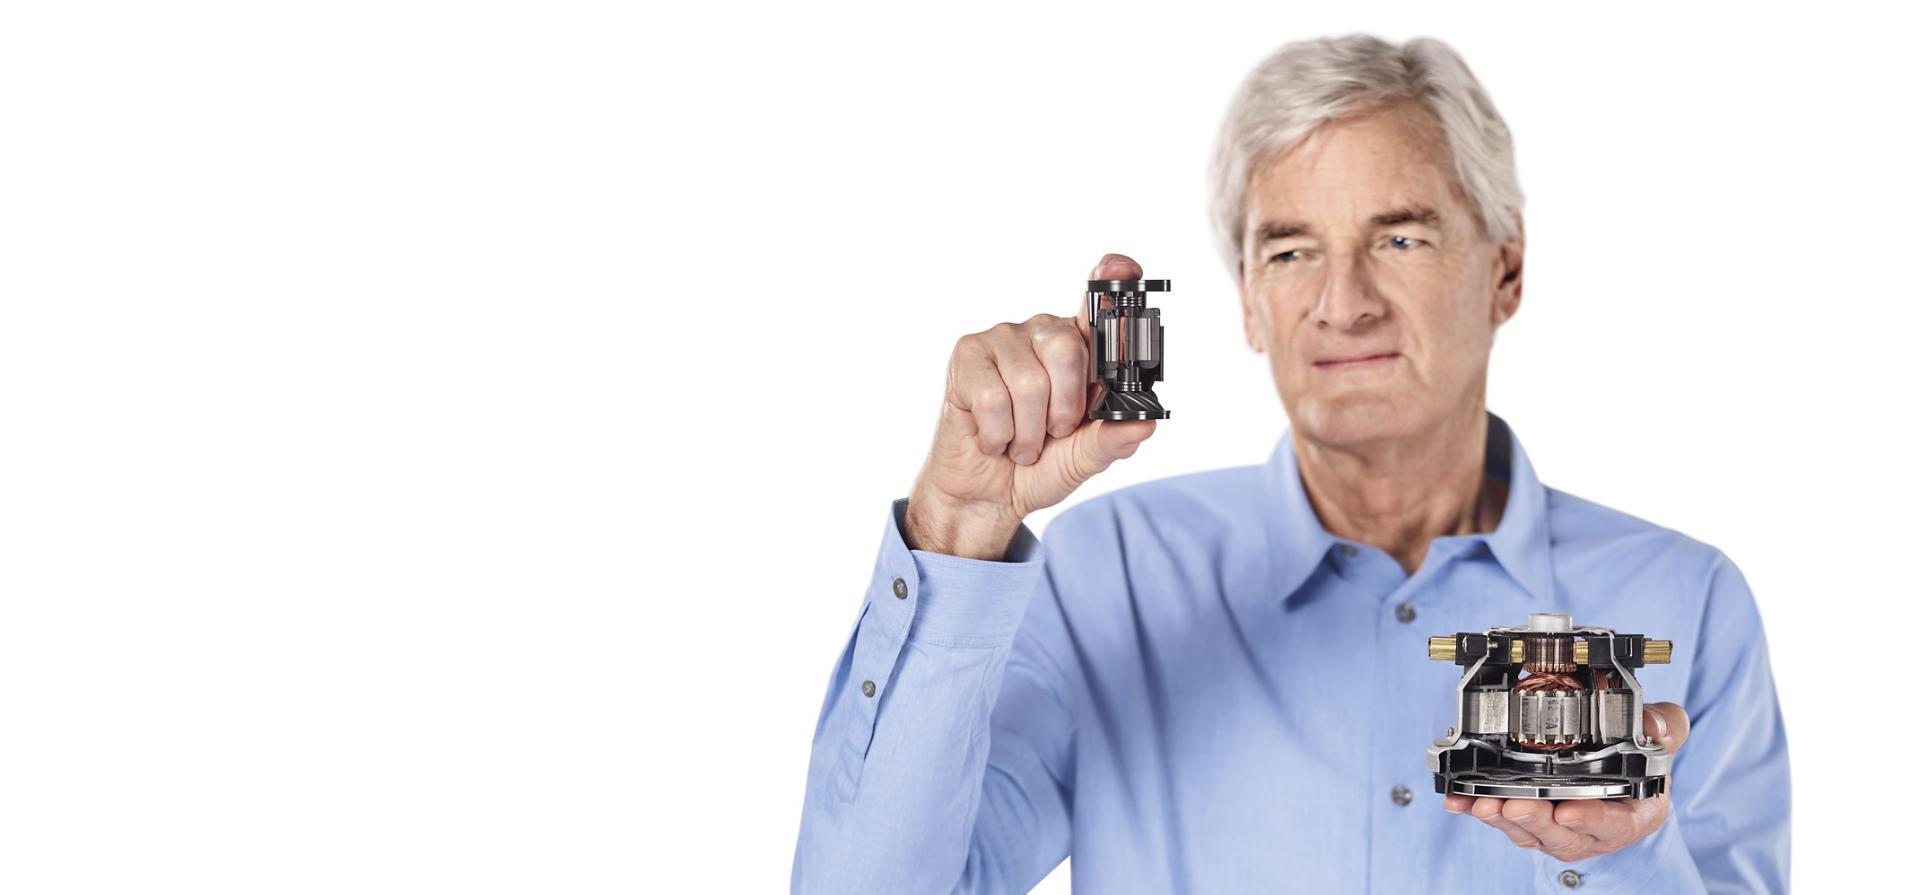 James Dyson holding Dyson digital motor V10